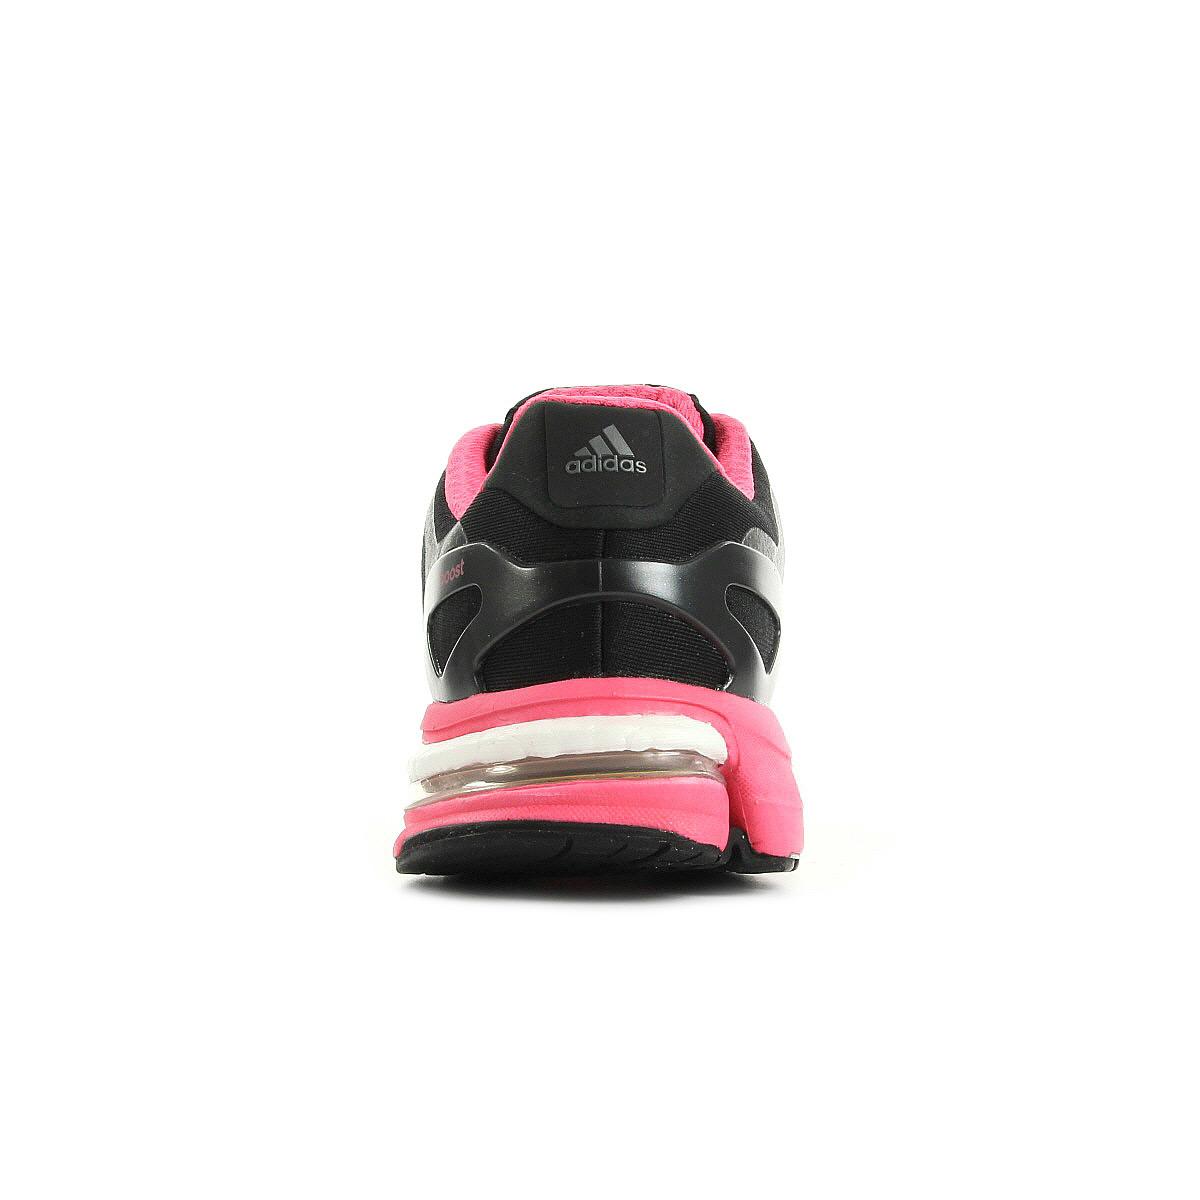 promo code 7d0df d737d adidas Performance Adistar boost W esm